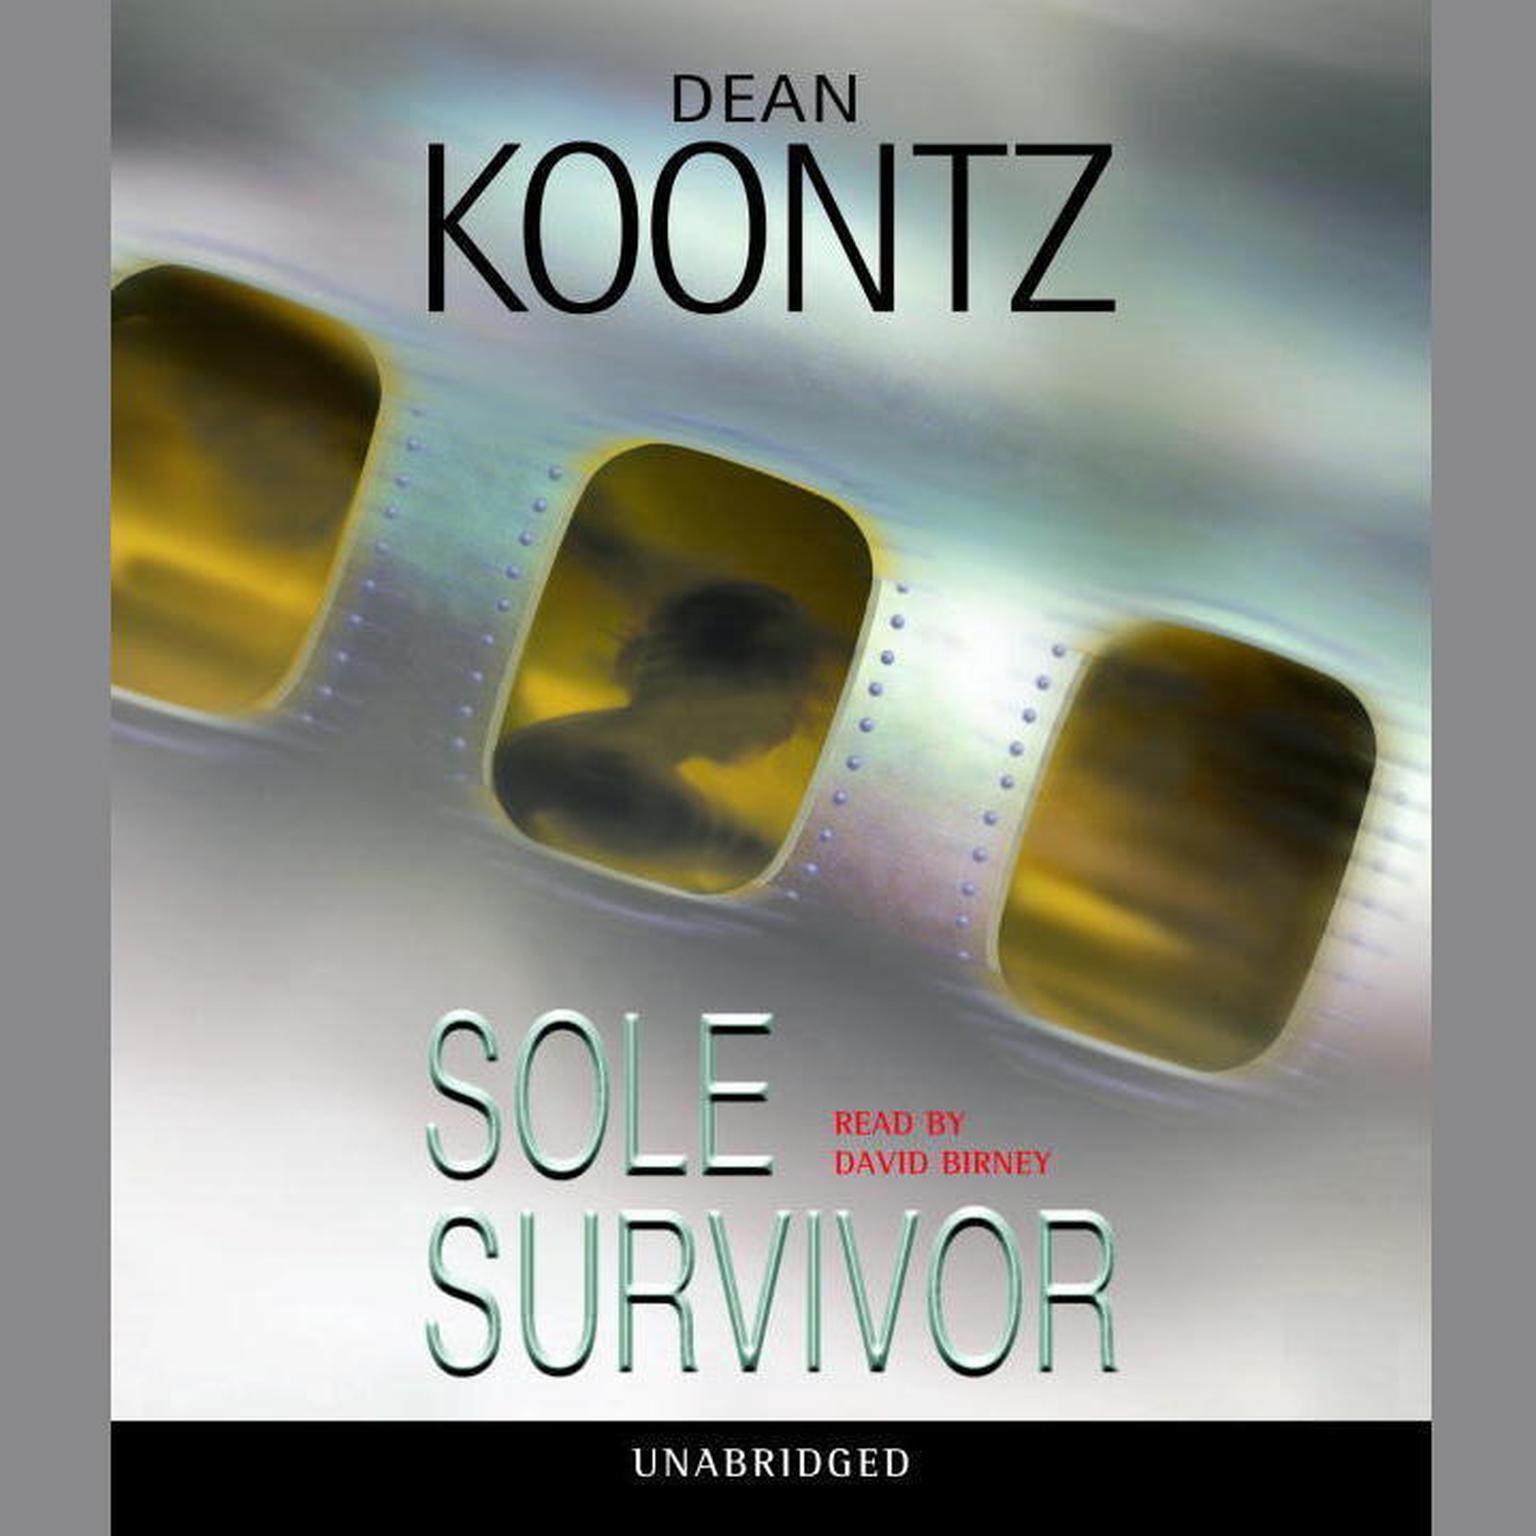 Sole Survivor - Audiobook by Dean Koontz, read by Ryan Burke